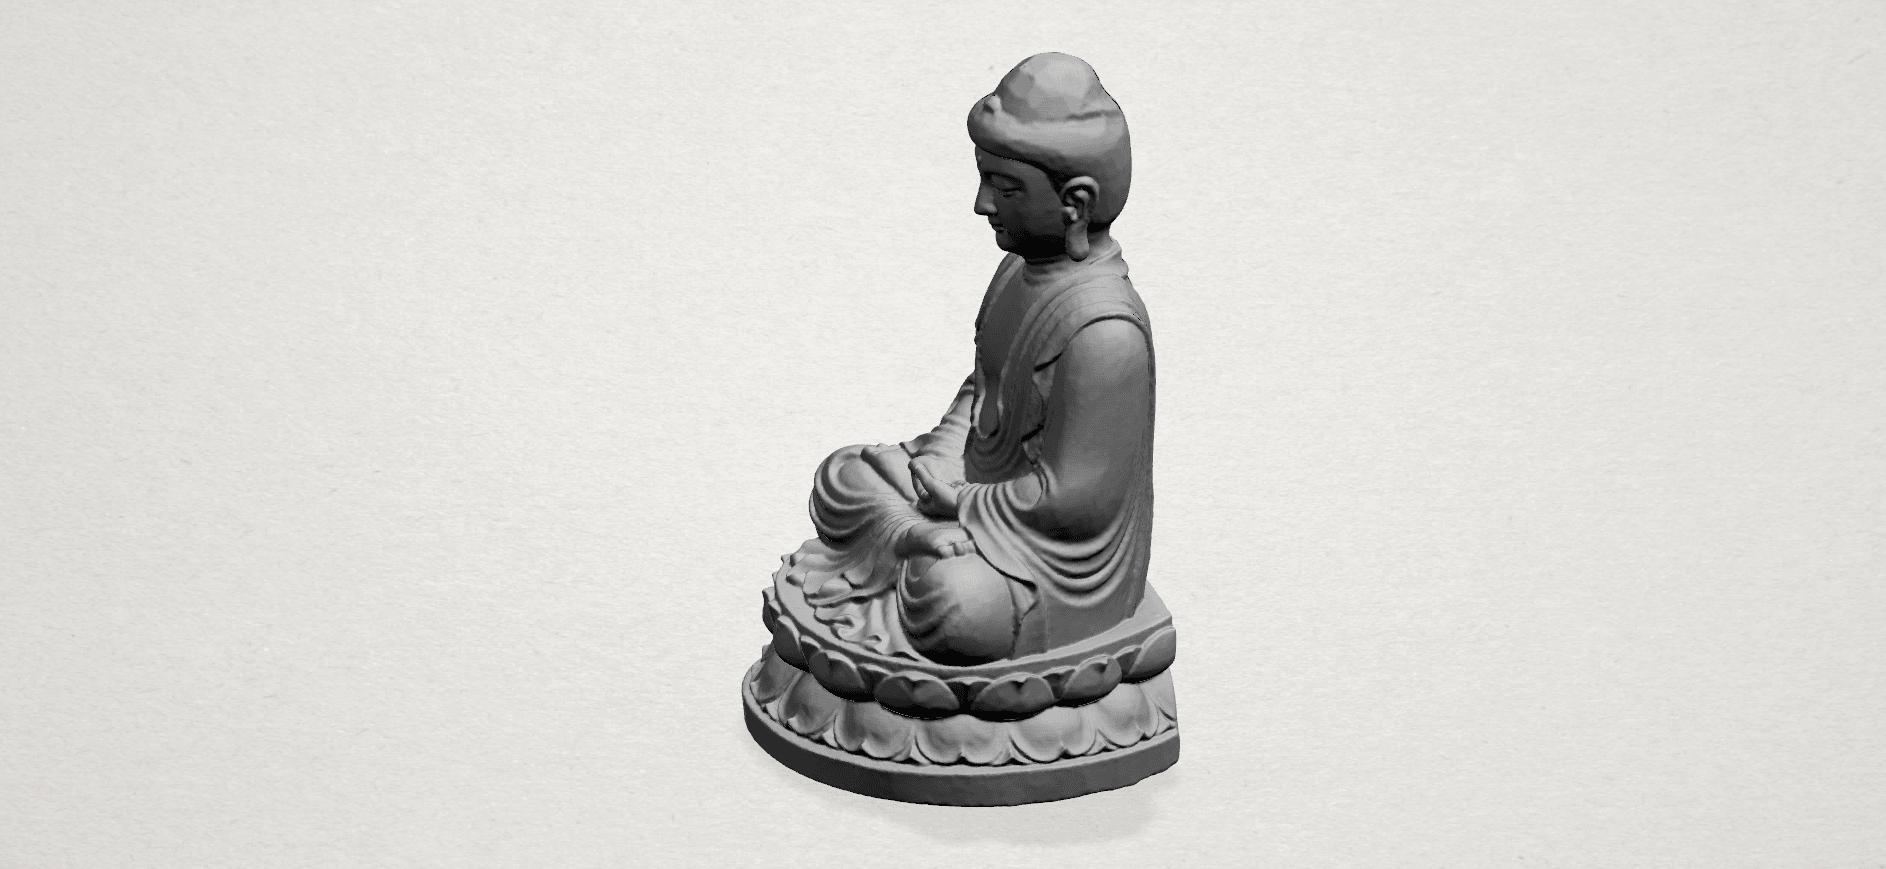 Gautama Buddha young - A03.png Télécharger fichier STL gratuit Gautama Bouddha Bouddha • Objet imprimable en 3D, GeorgesNikkei